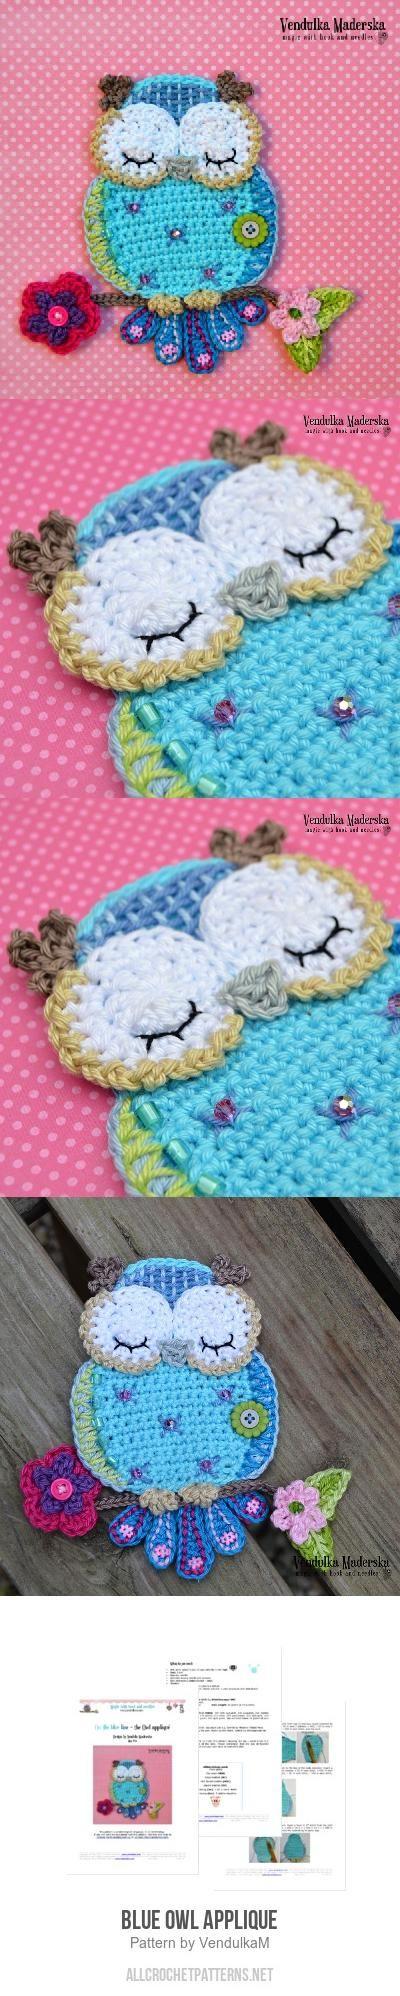 Blue Owl Applique Crochet Pattern for purchase & Best 25+ Owl applique ideas on Pinterest | Free applique patterns ... pillowsntoast.com